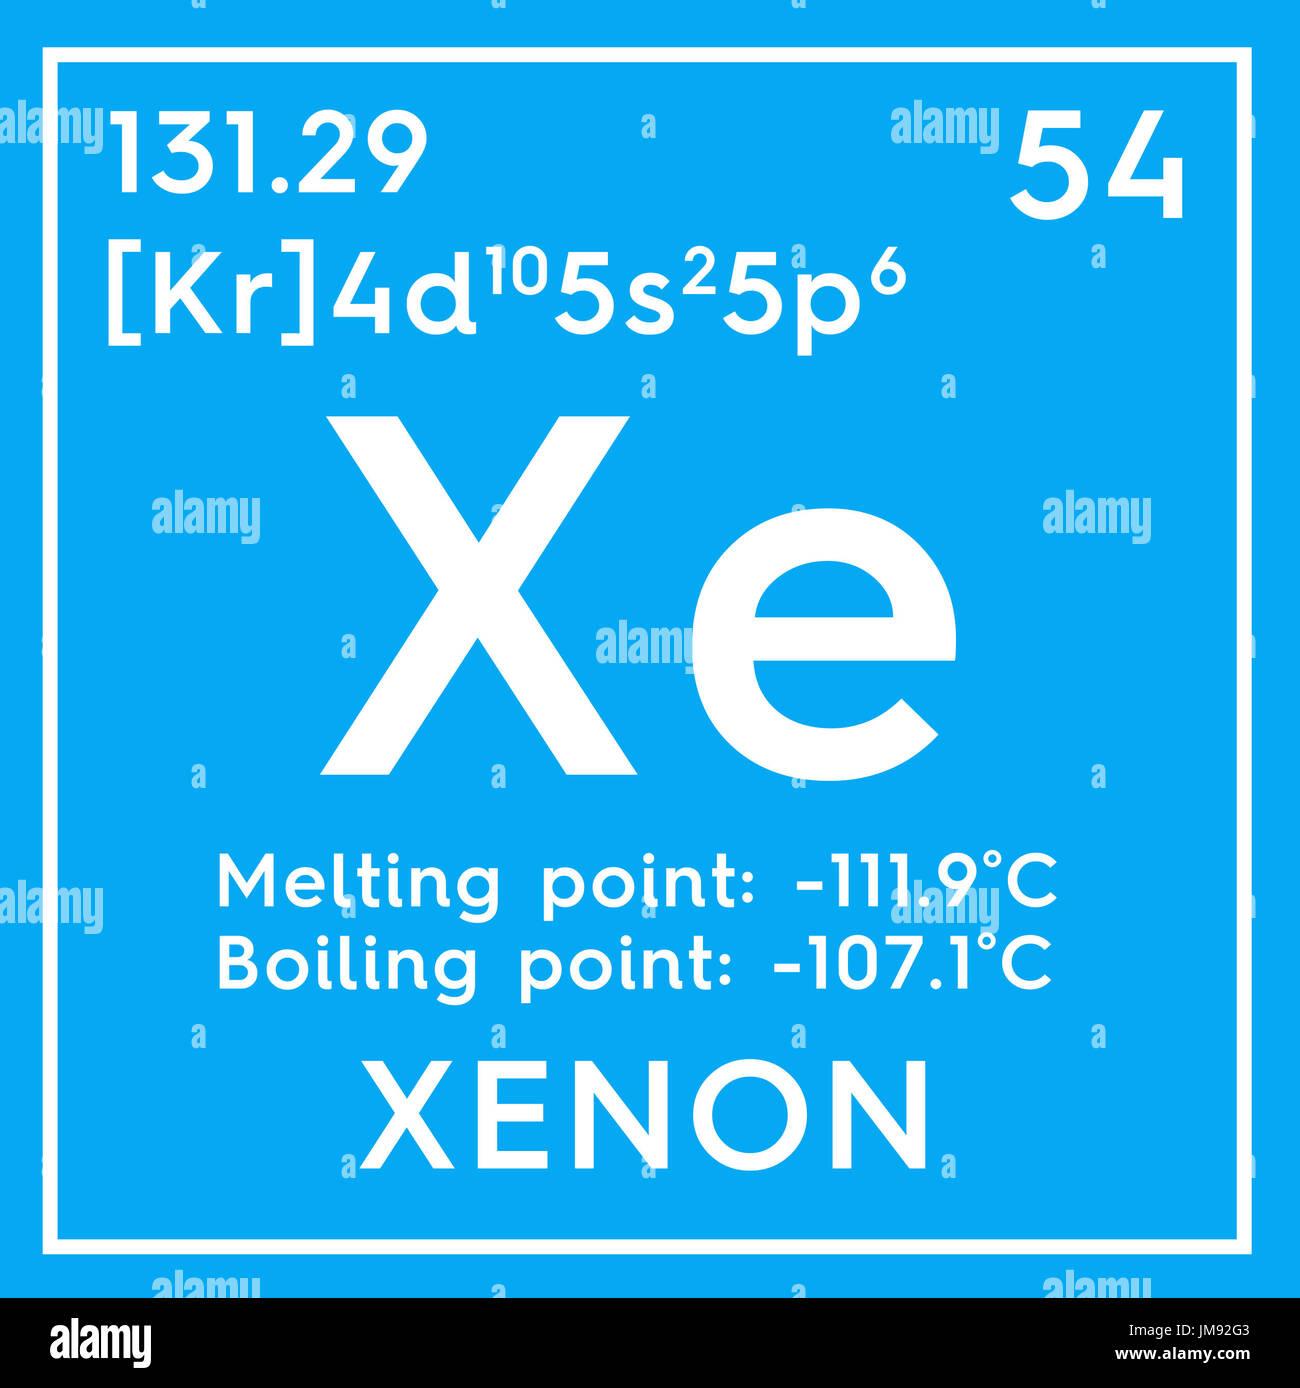 Mendeleevs periodic table stock photos mendeleevs periodic table xenon noble gases chemical element of mendeleevs periodic table xenon in square cube gamestrikefo Gallery